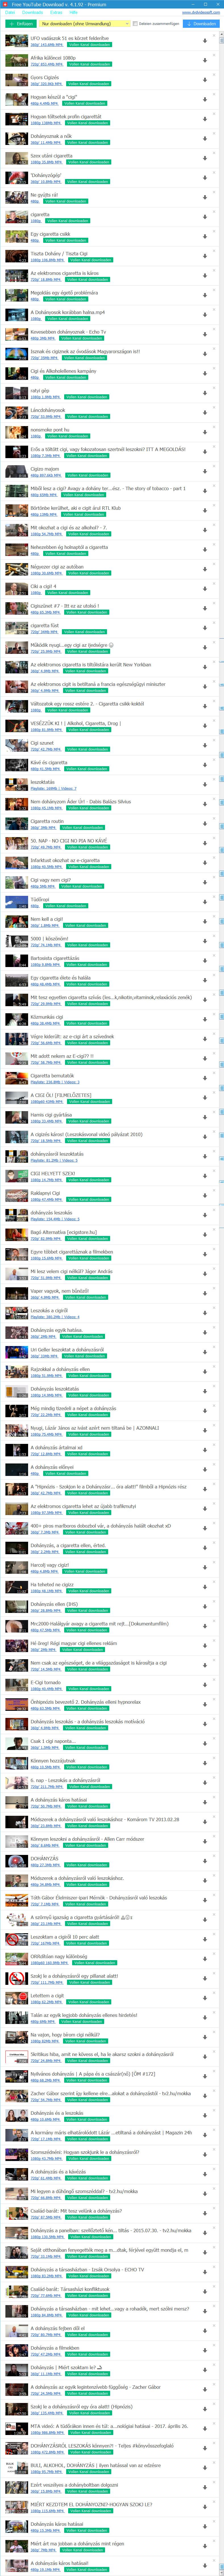 Fehler 105403 blockiert video download? - YouTube-Hilfe